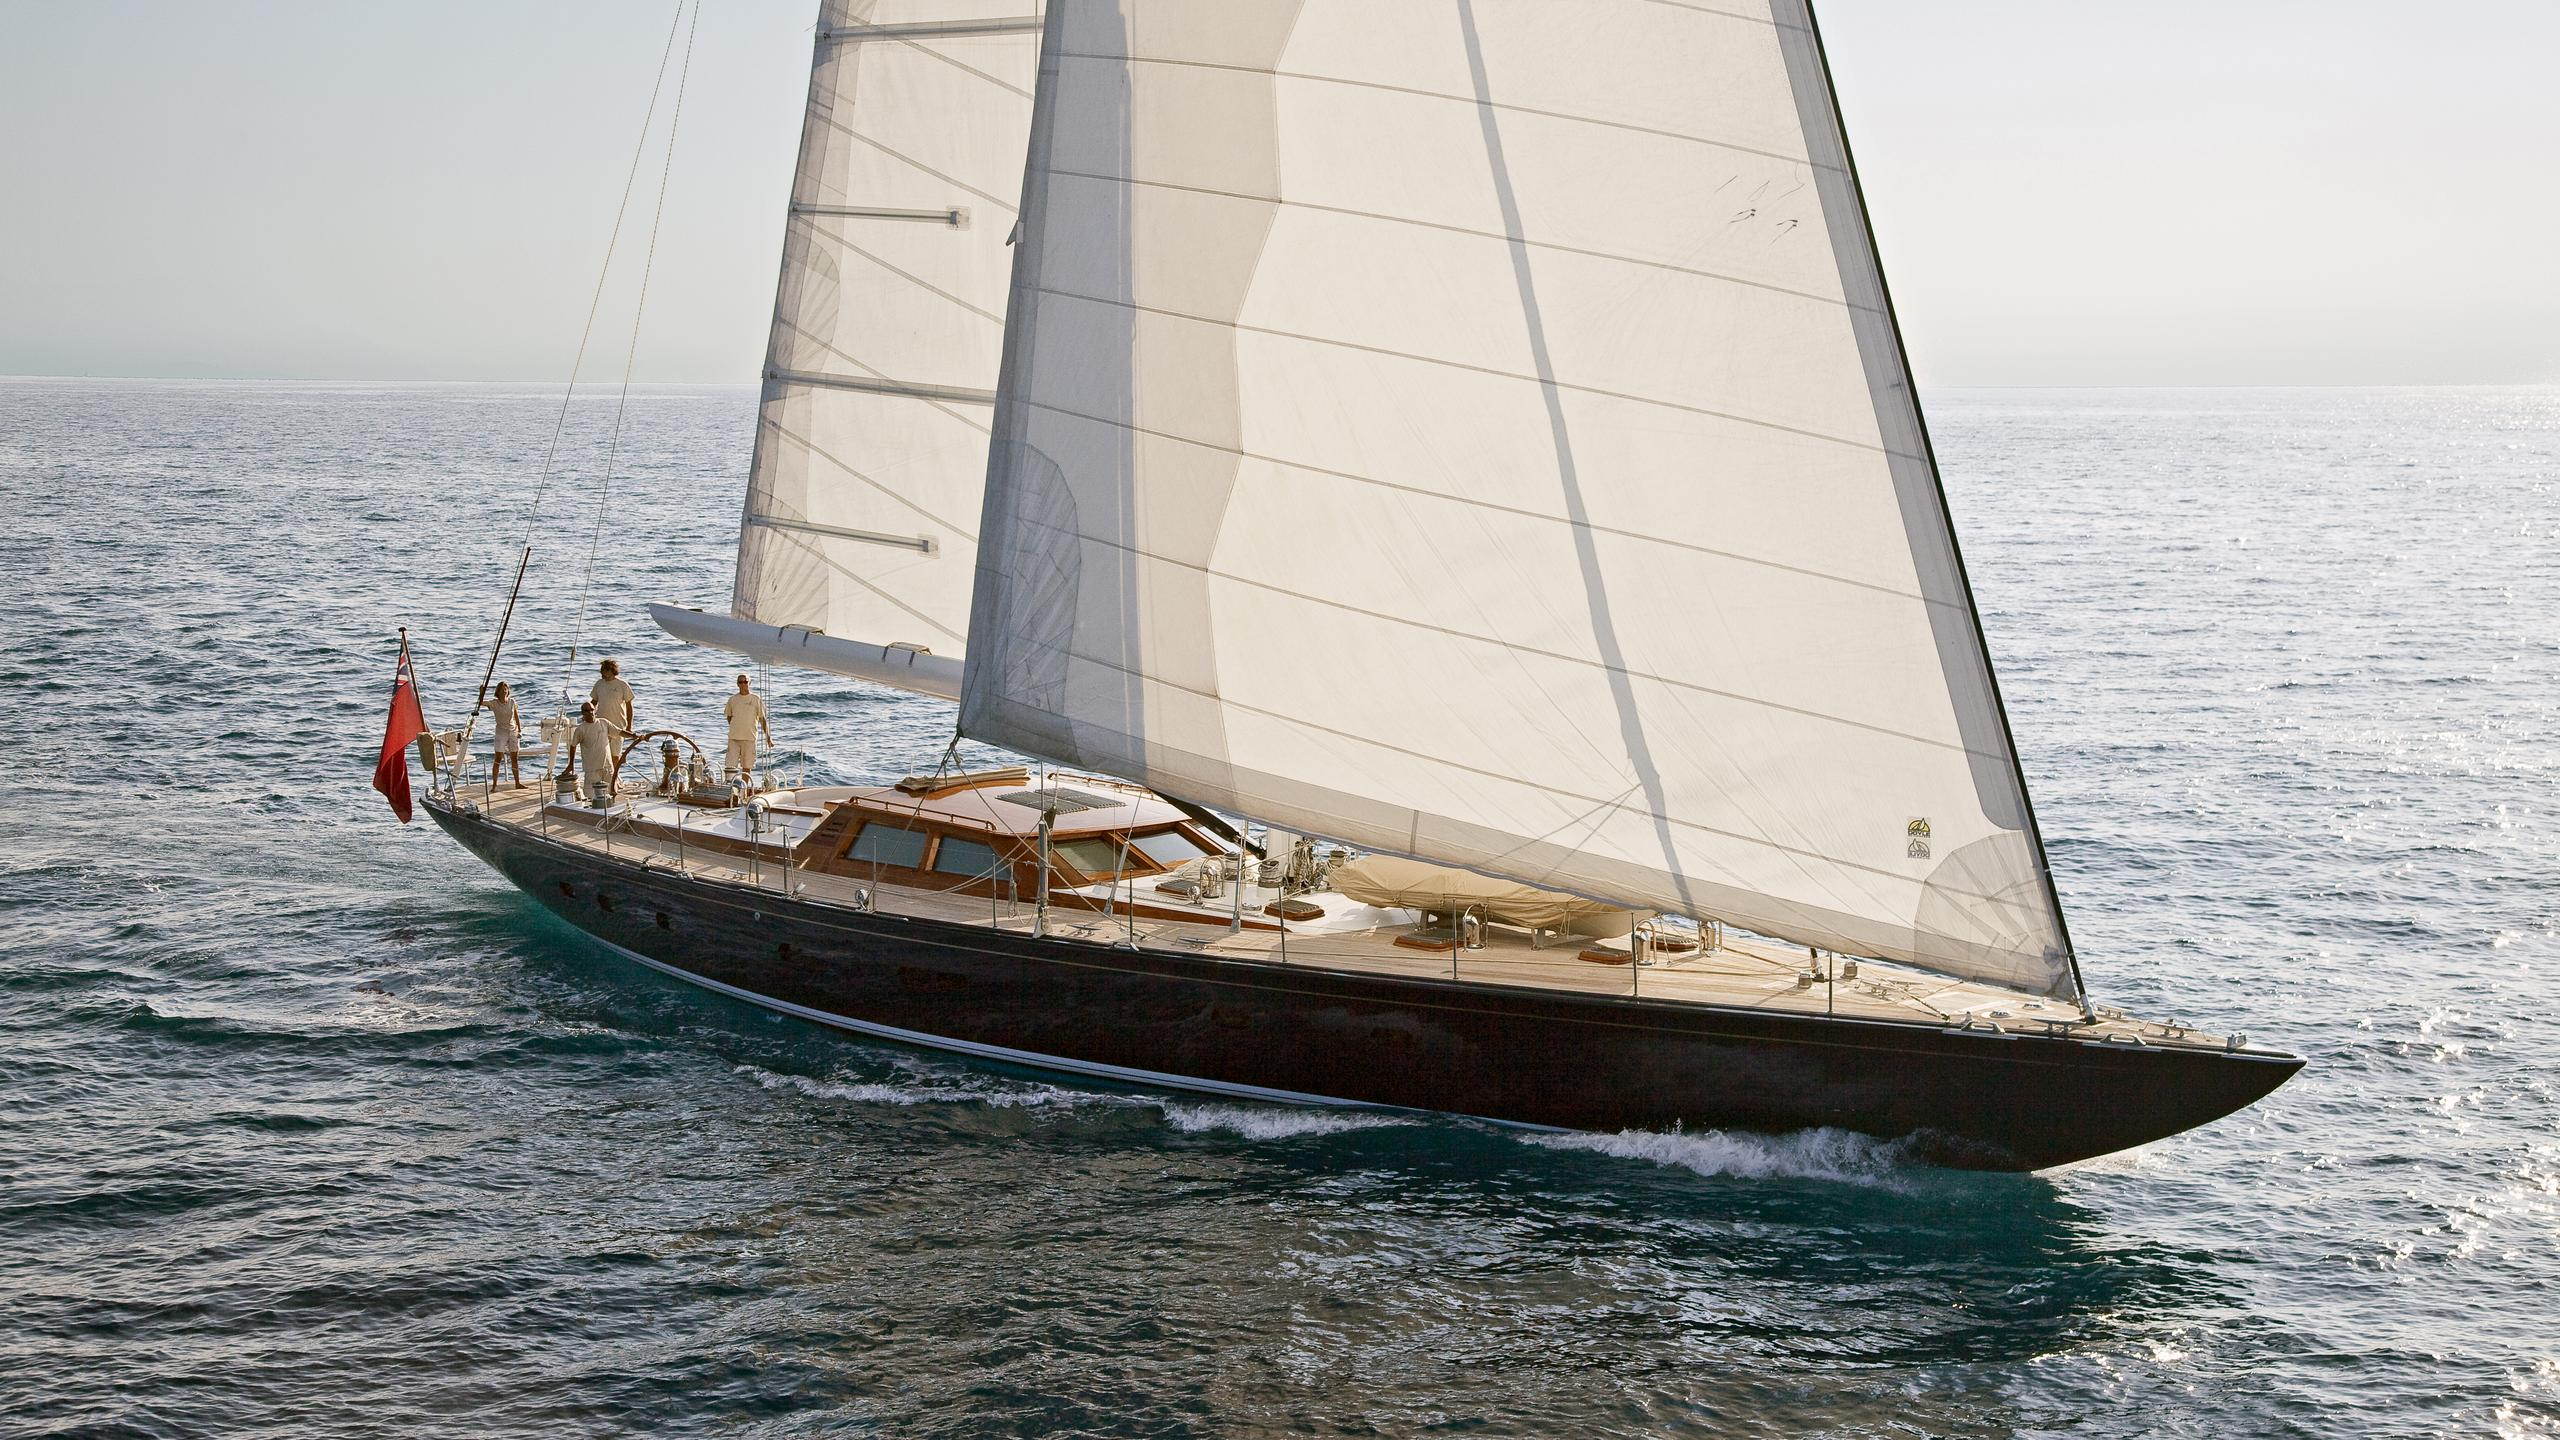 grit-mariposa-3a-yacht-sailing